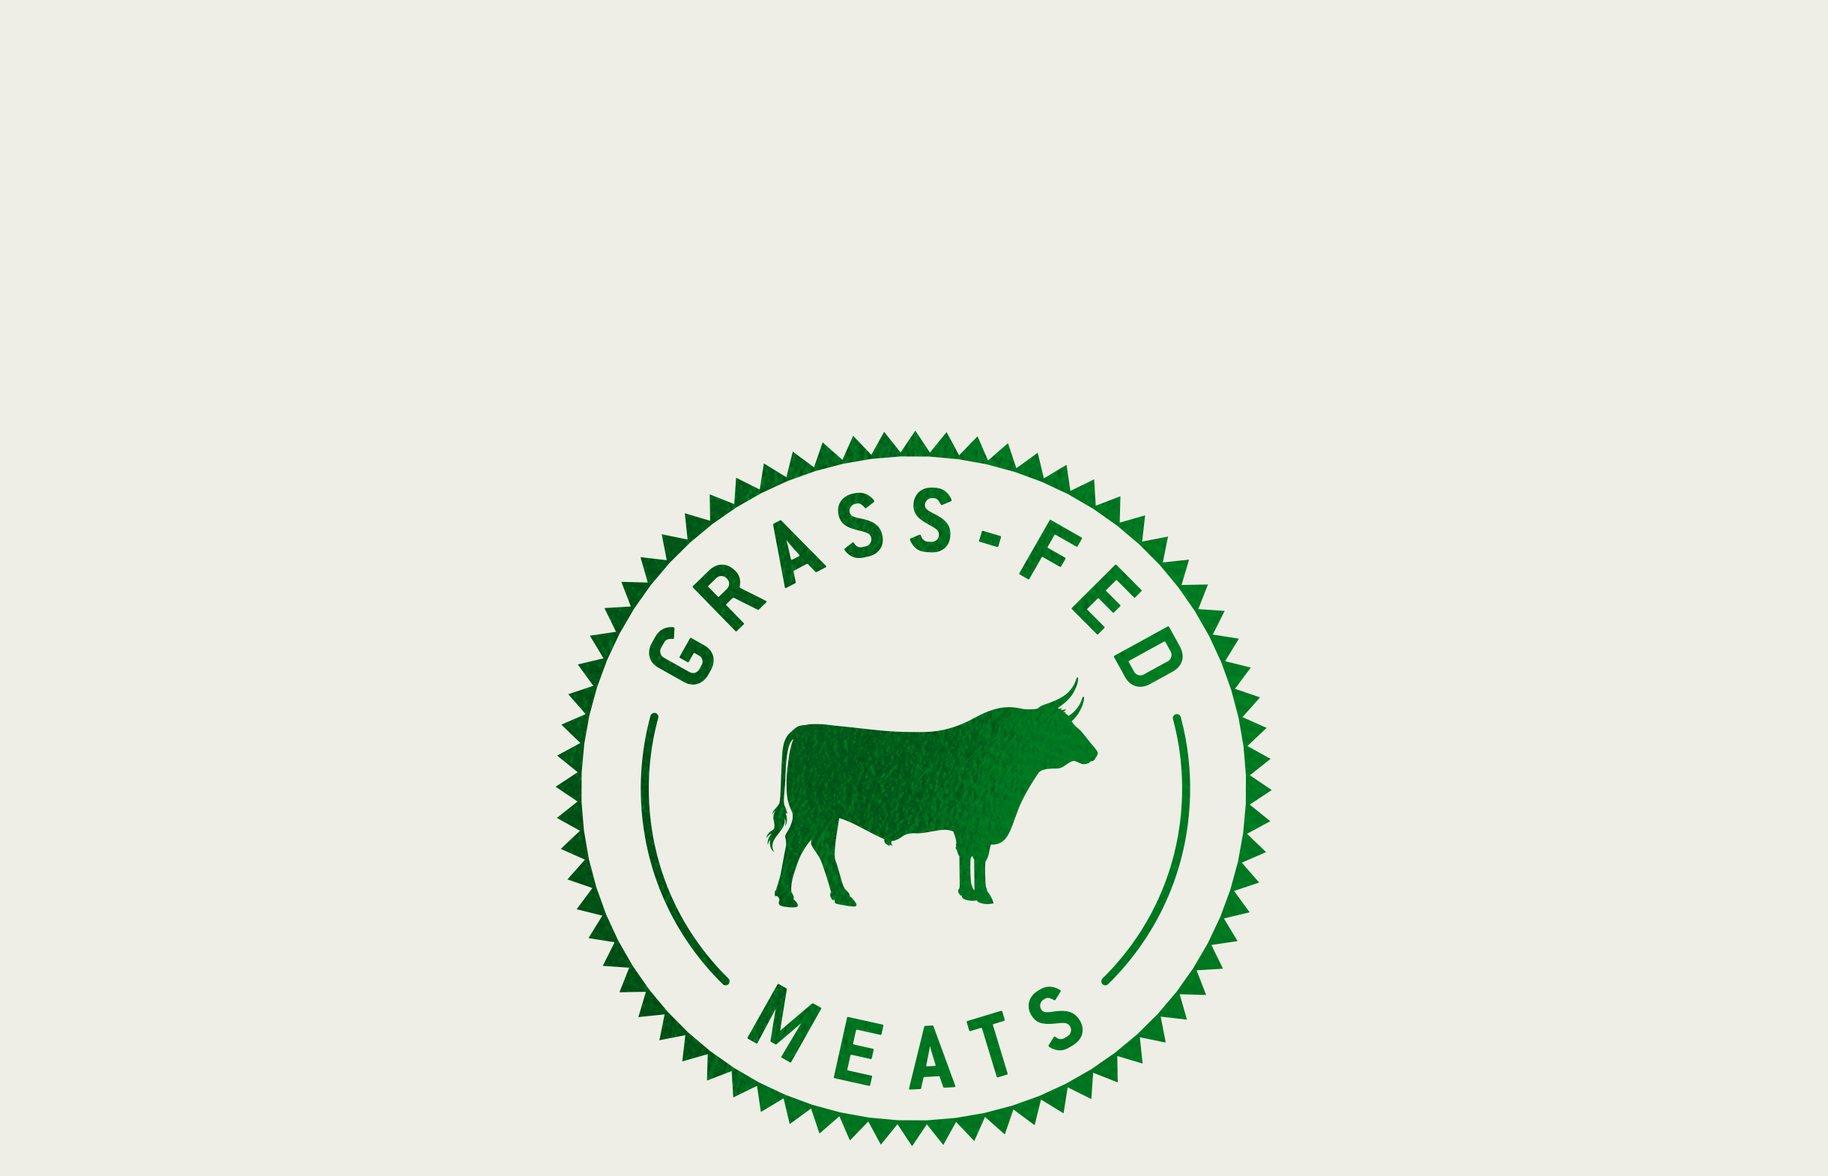 First Light Meats case study